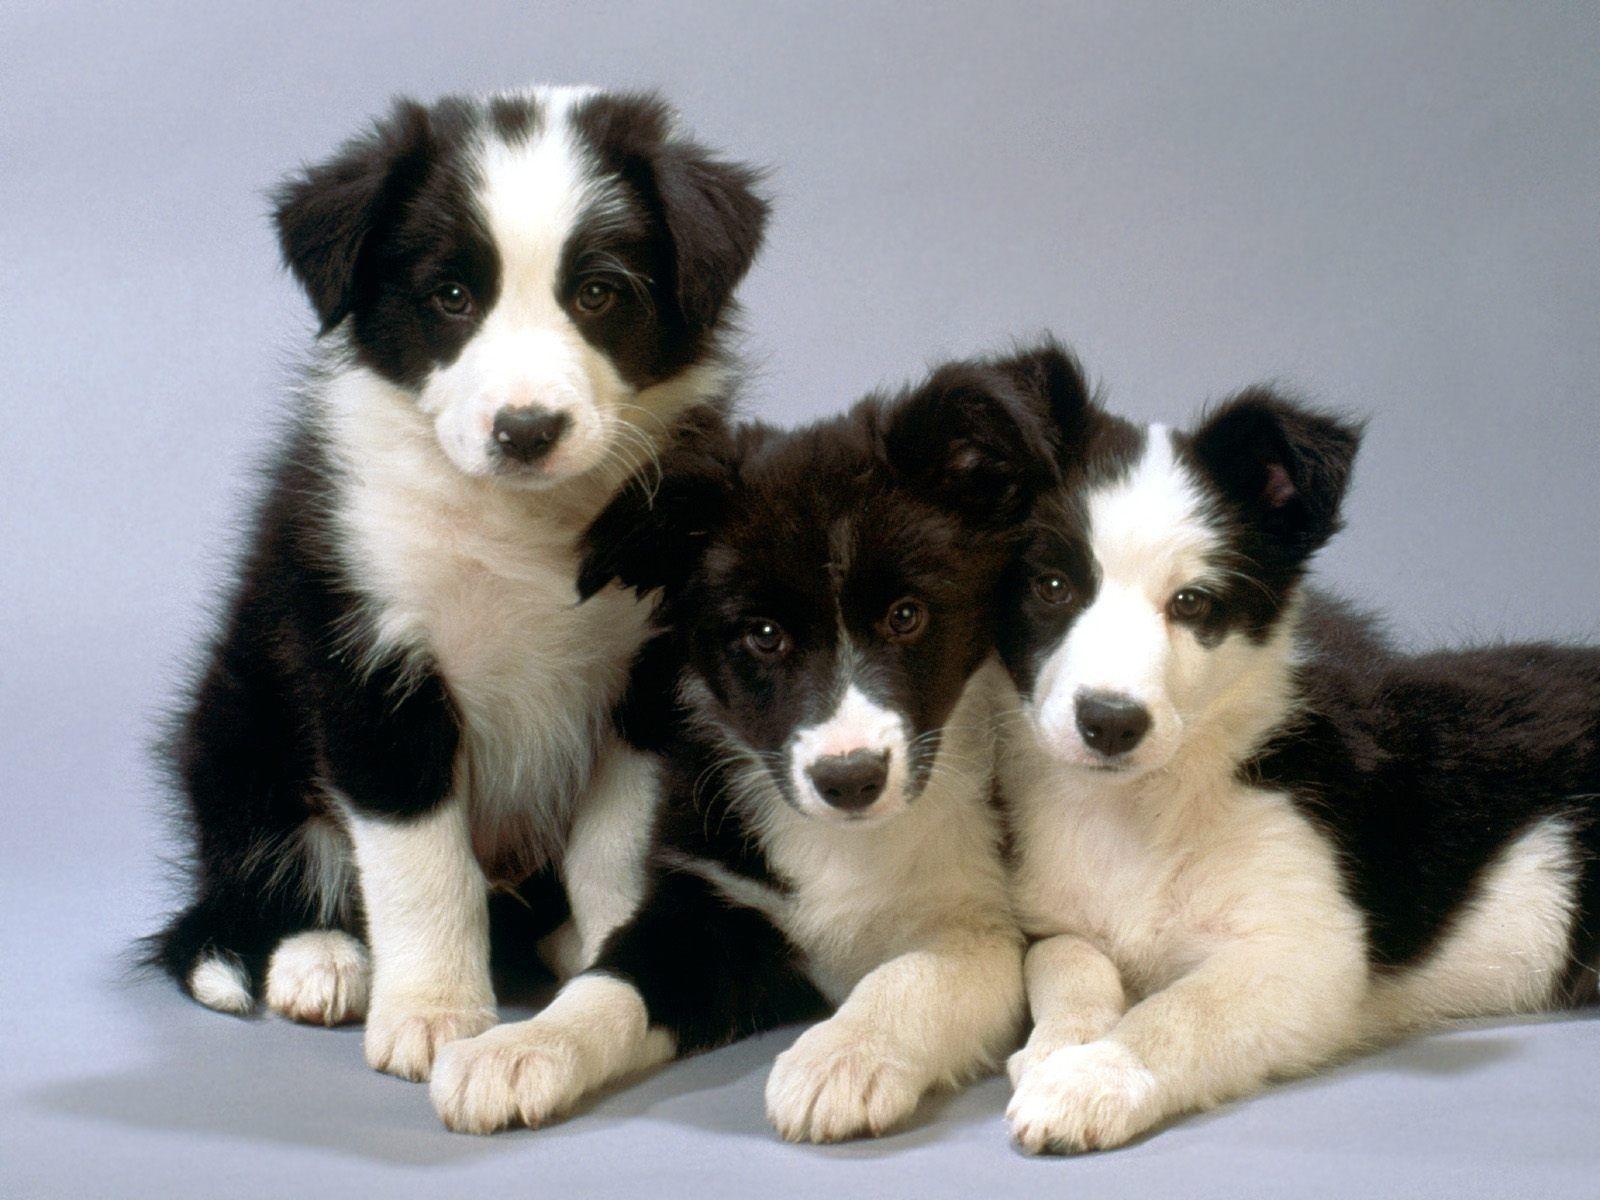 Favorite Healthiest Dog Food Dog Training Healthiest Dog Food Dog Training Pinterest Dog Healthiest Dog Breeds Large Healthiest Dog Breeds List bark post Healthiest Dog Breeds